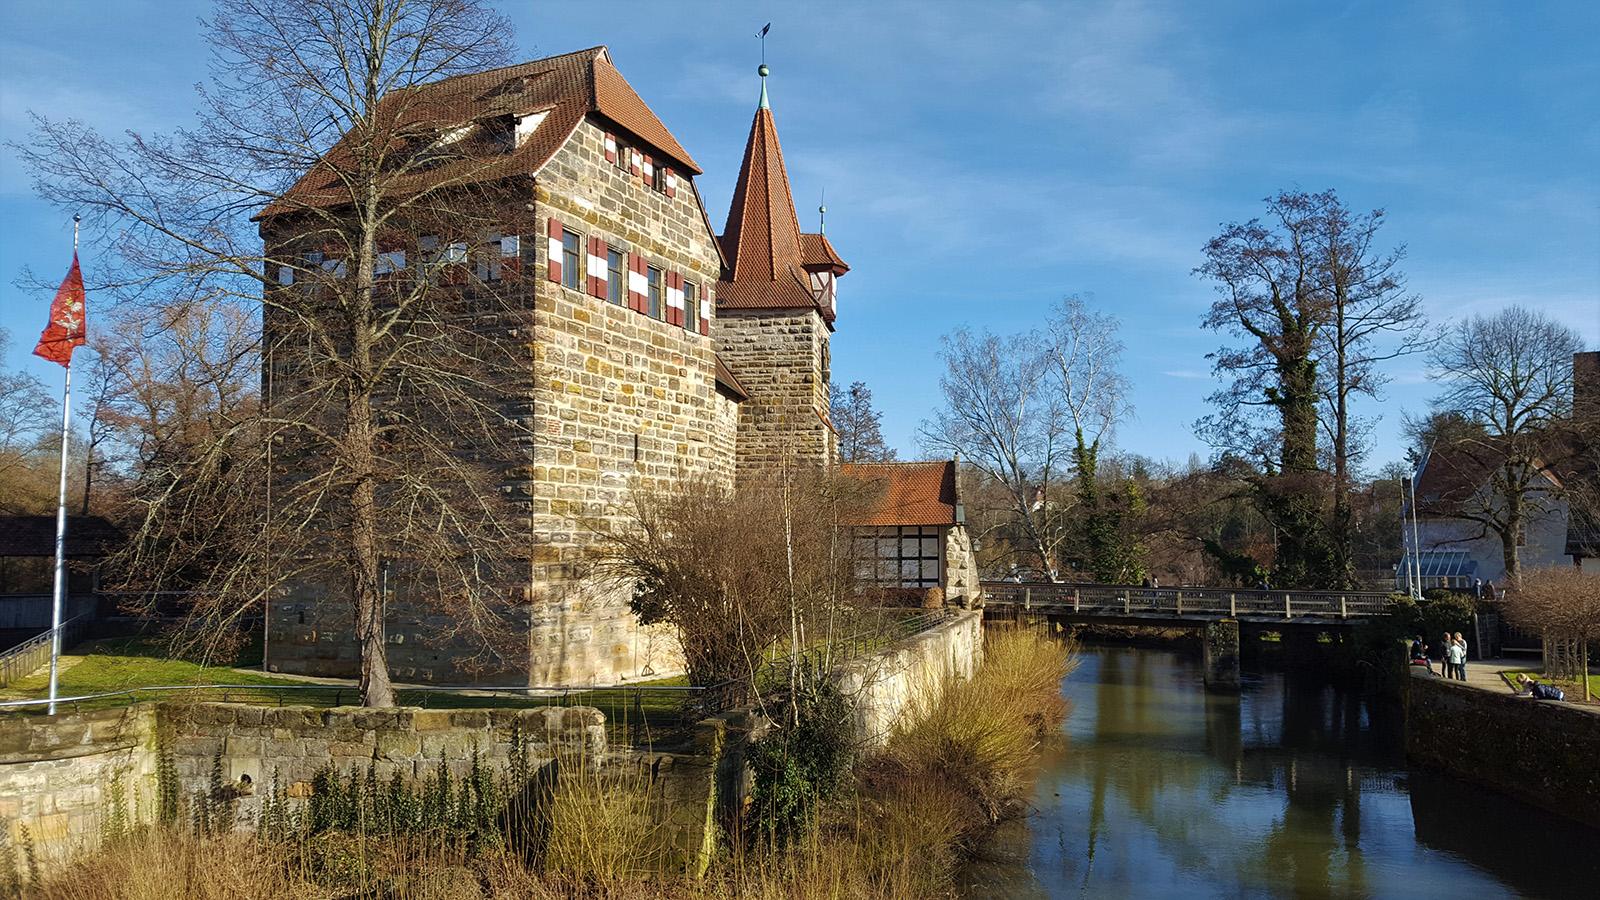 The Kaiserberg in Lauf an der Pegnitz